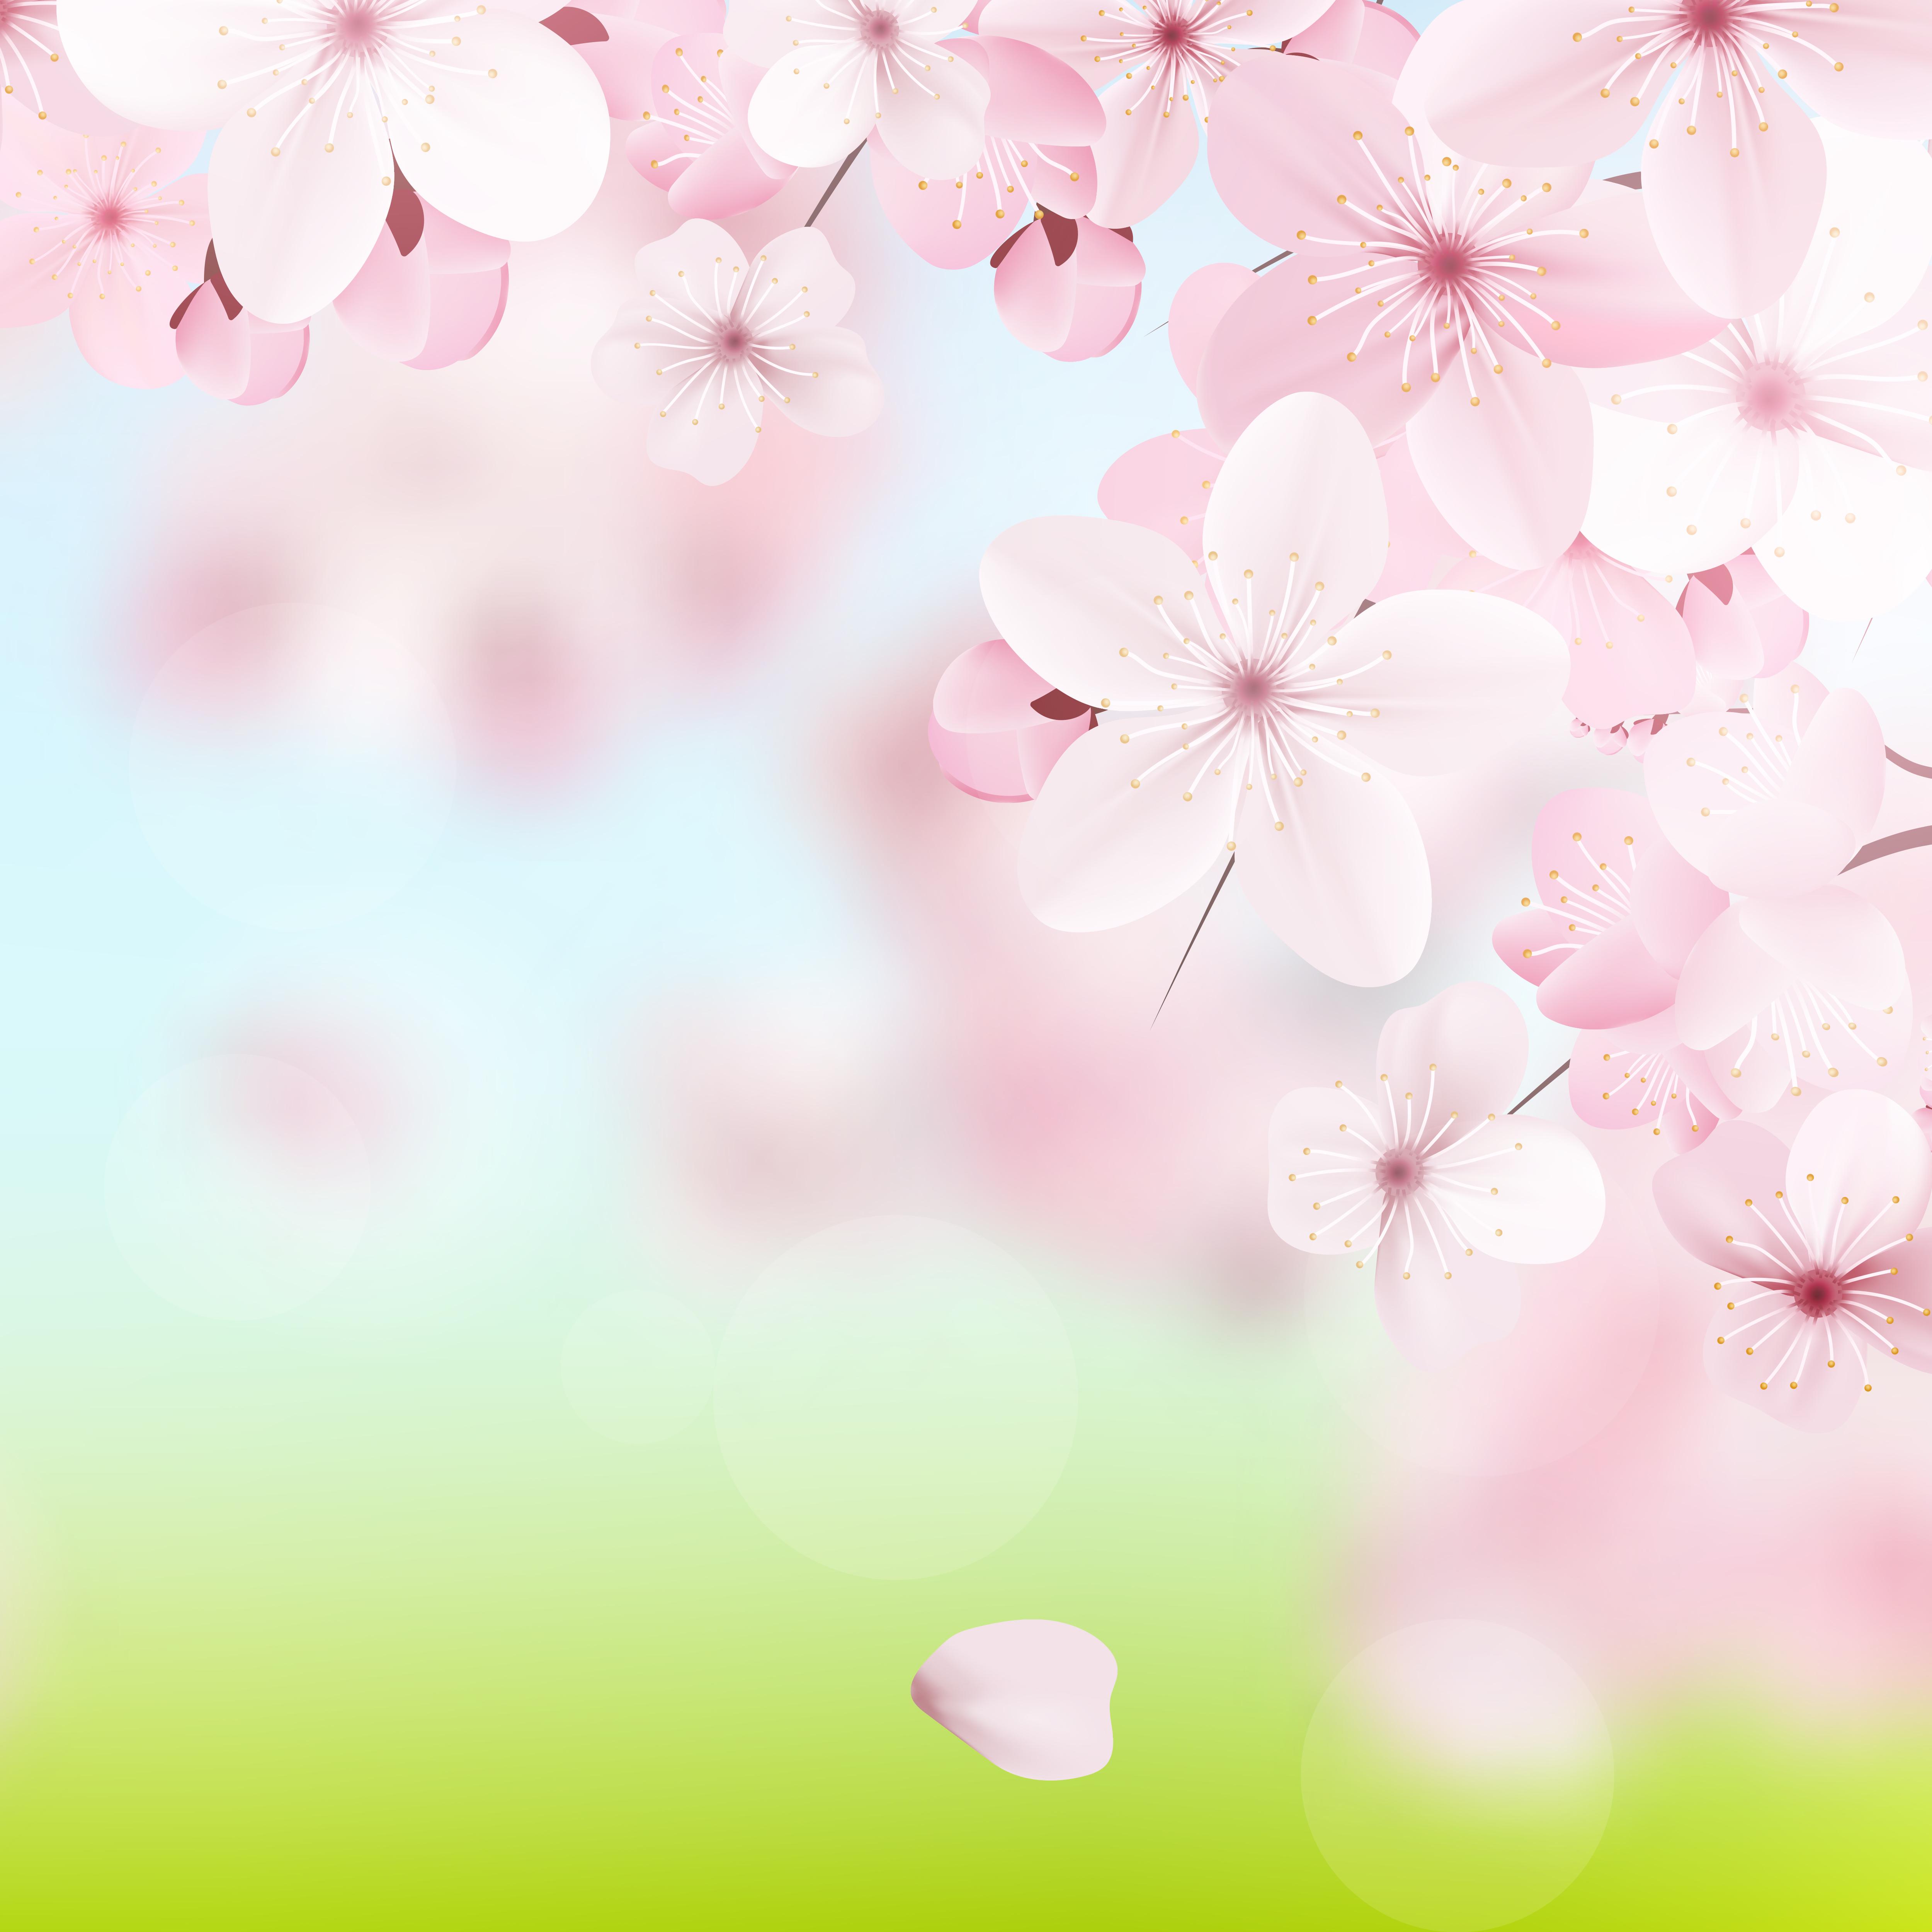 Delicate Floral Background Design Download Free Vectors